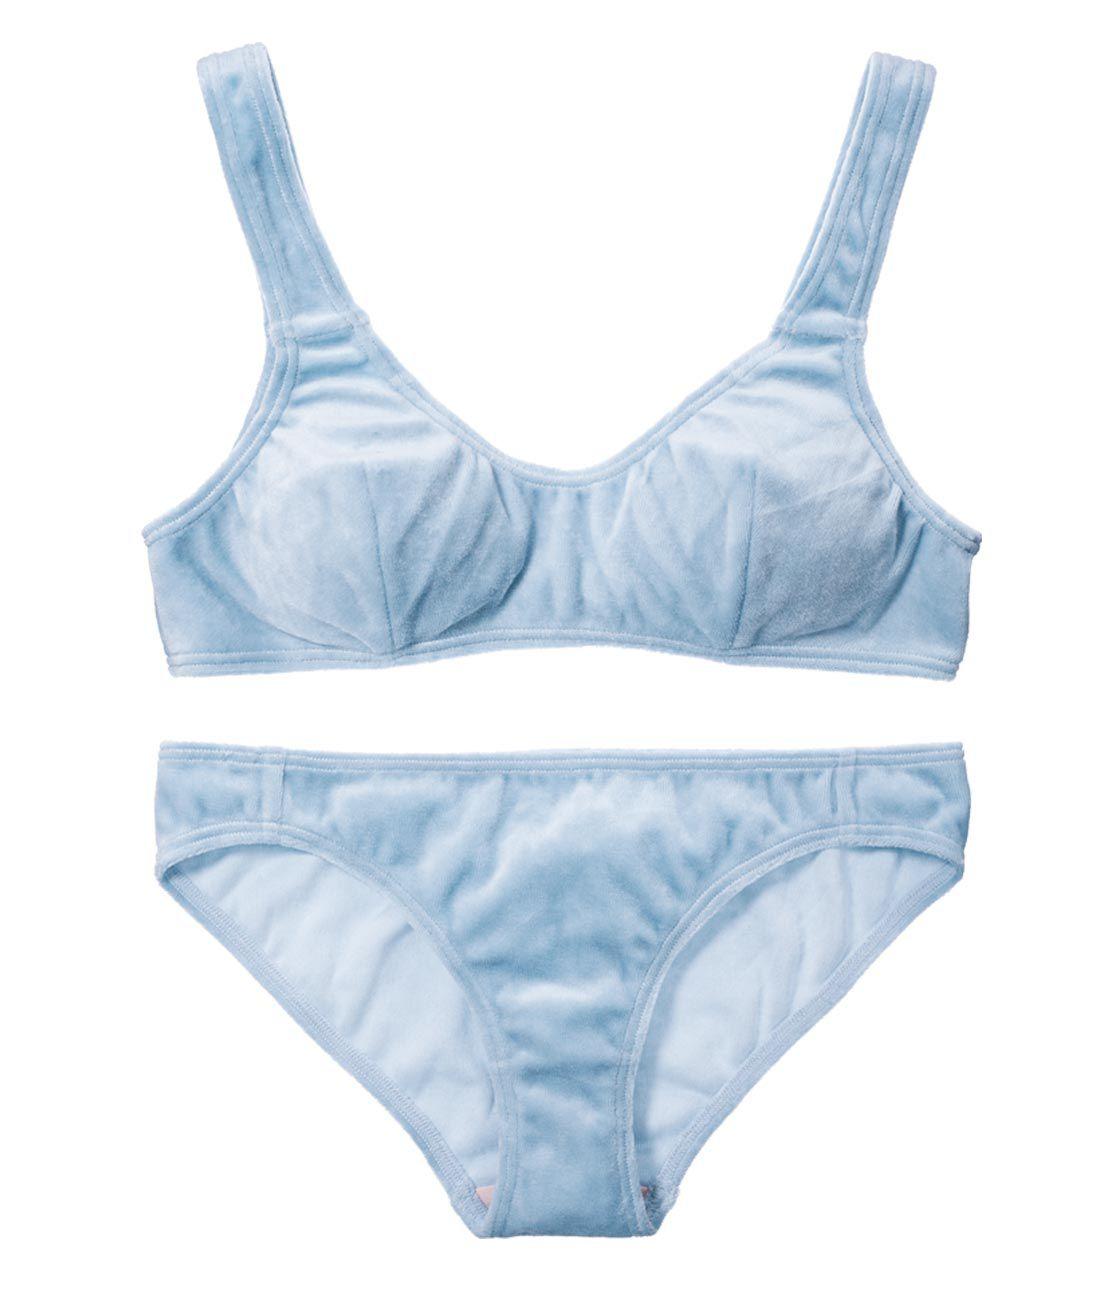 YM 2WAY简单丝绒胸罩马桶套